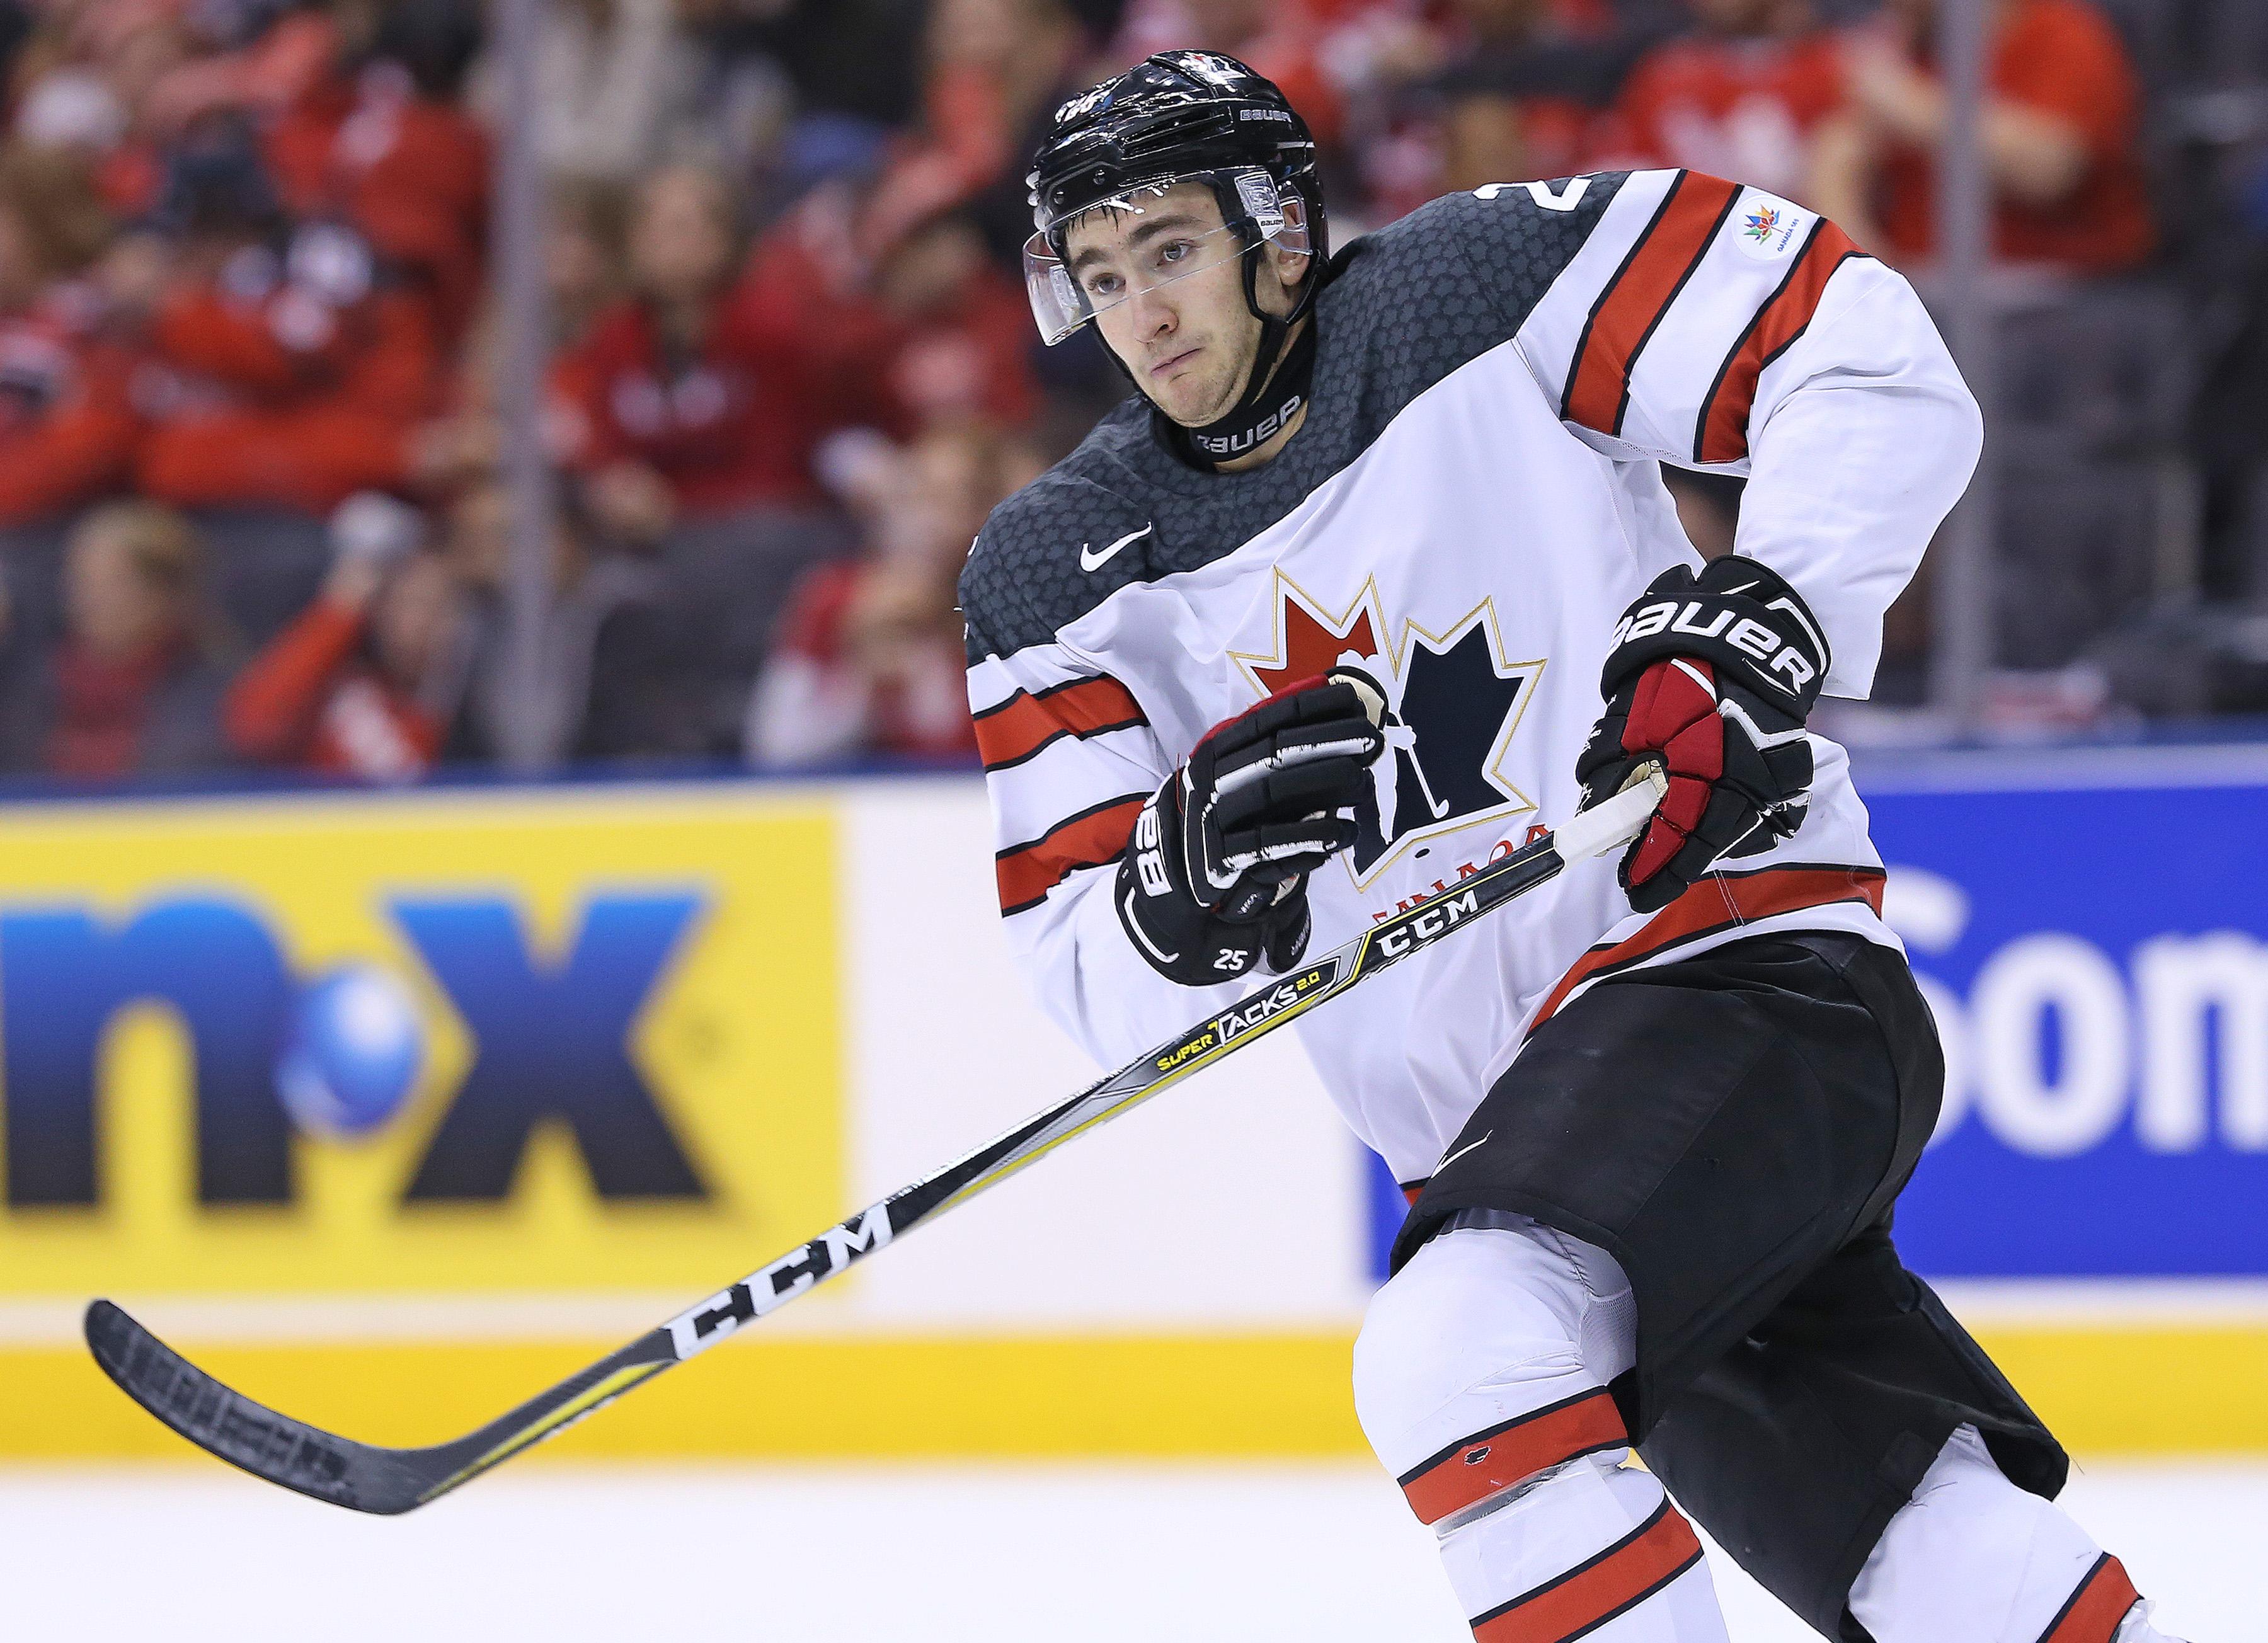 Canada v Latvia - 2017 IIHF World Junior Championship